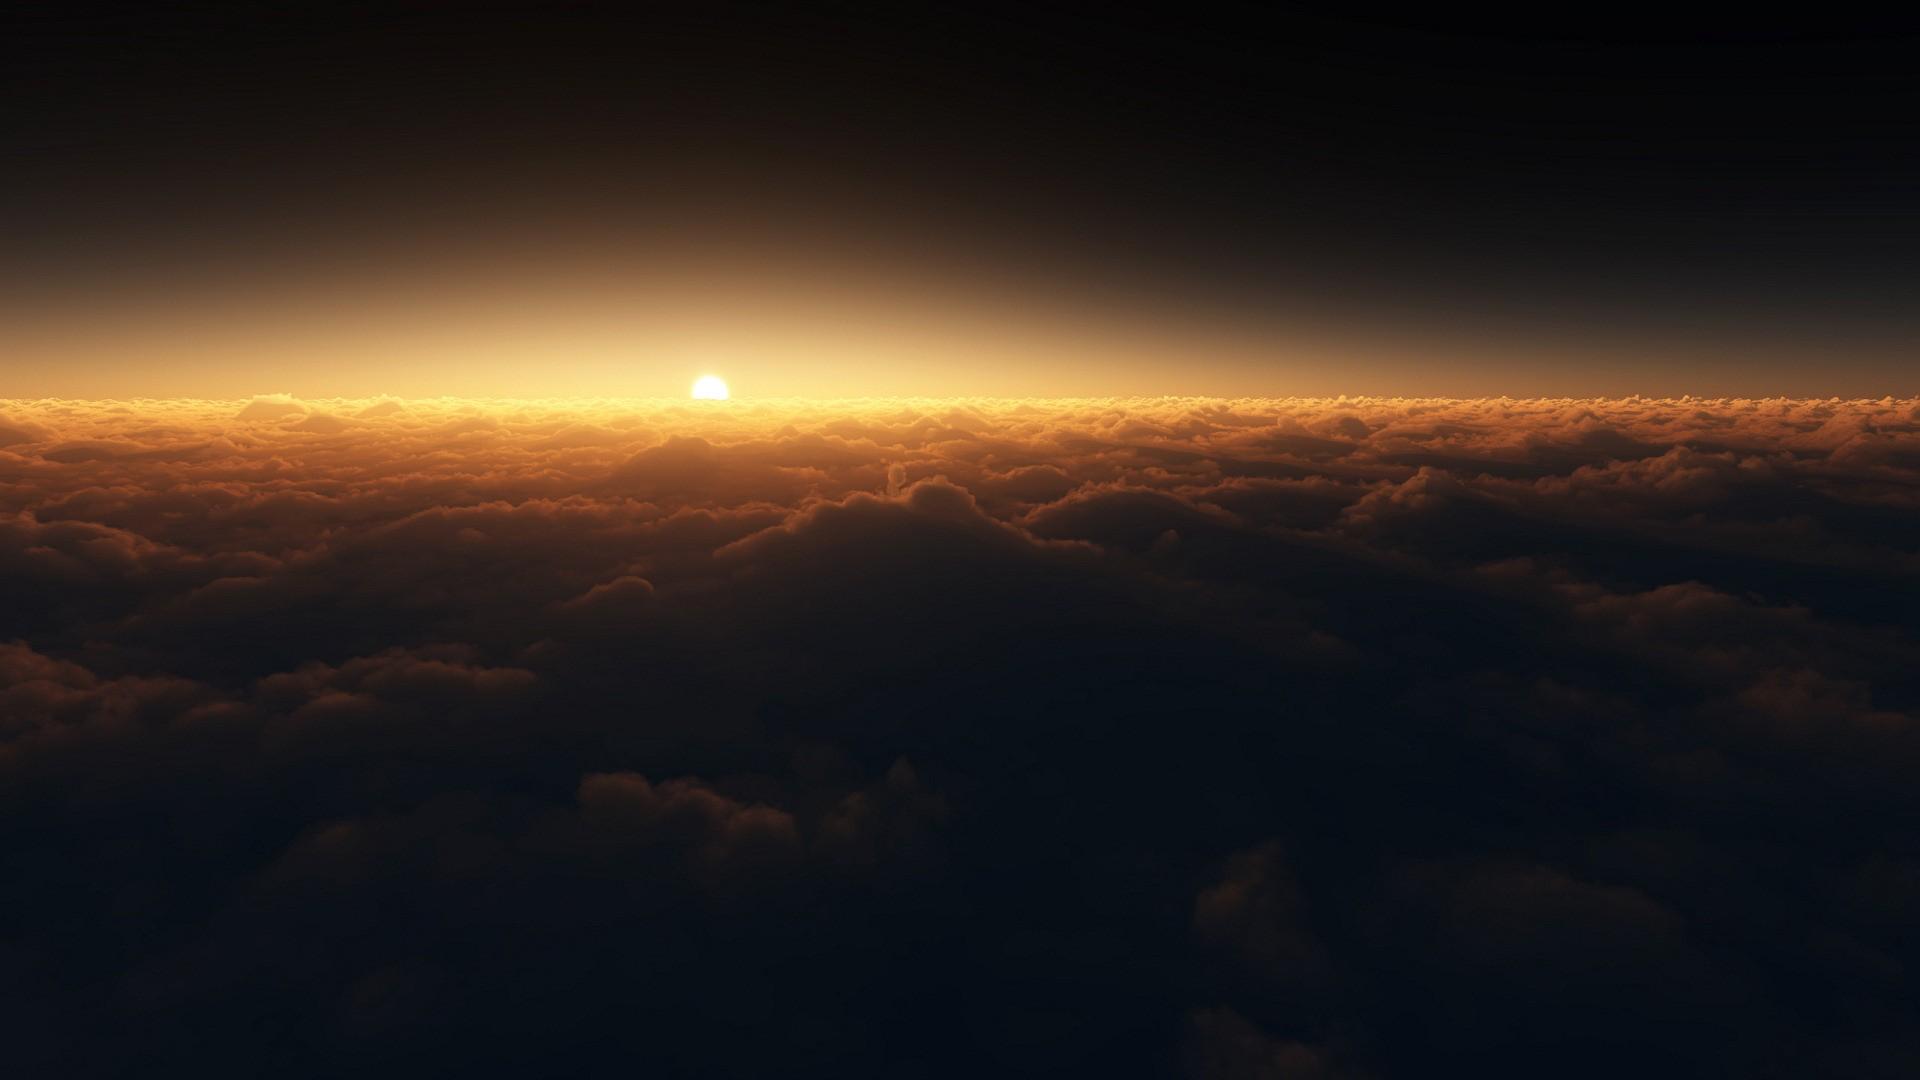 sun and night sky